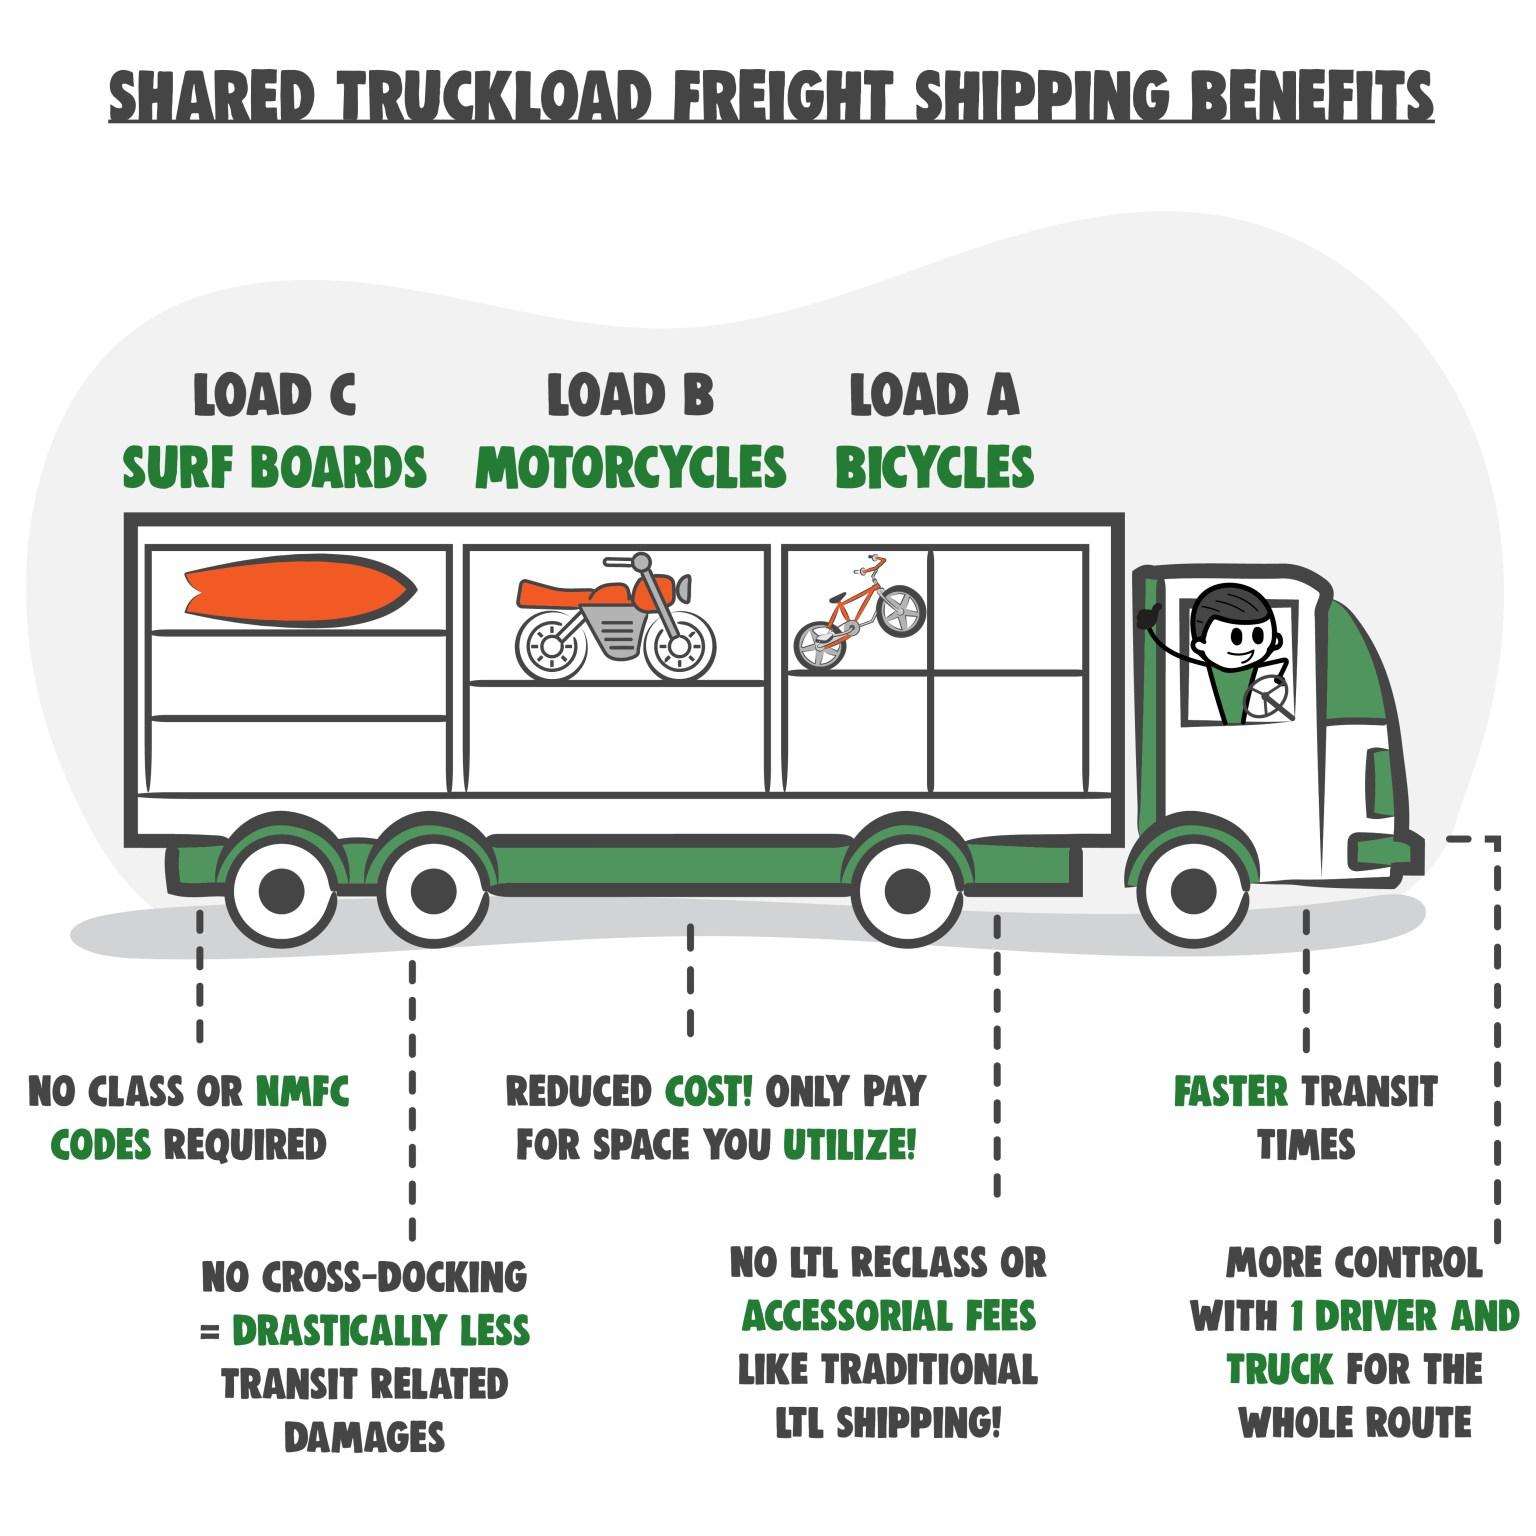 Shared Truckload Benefits